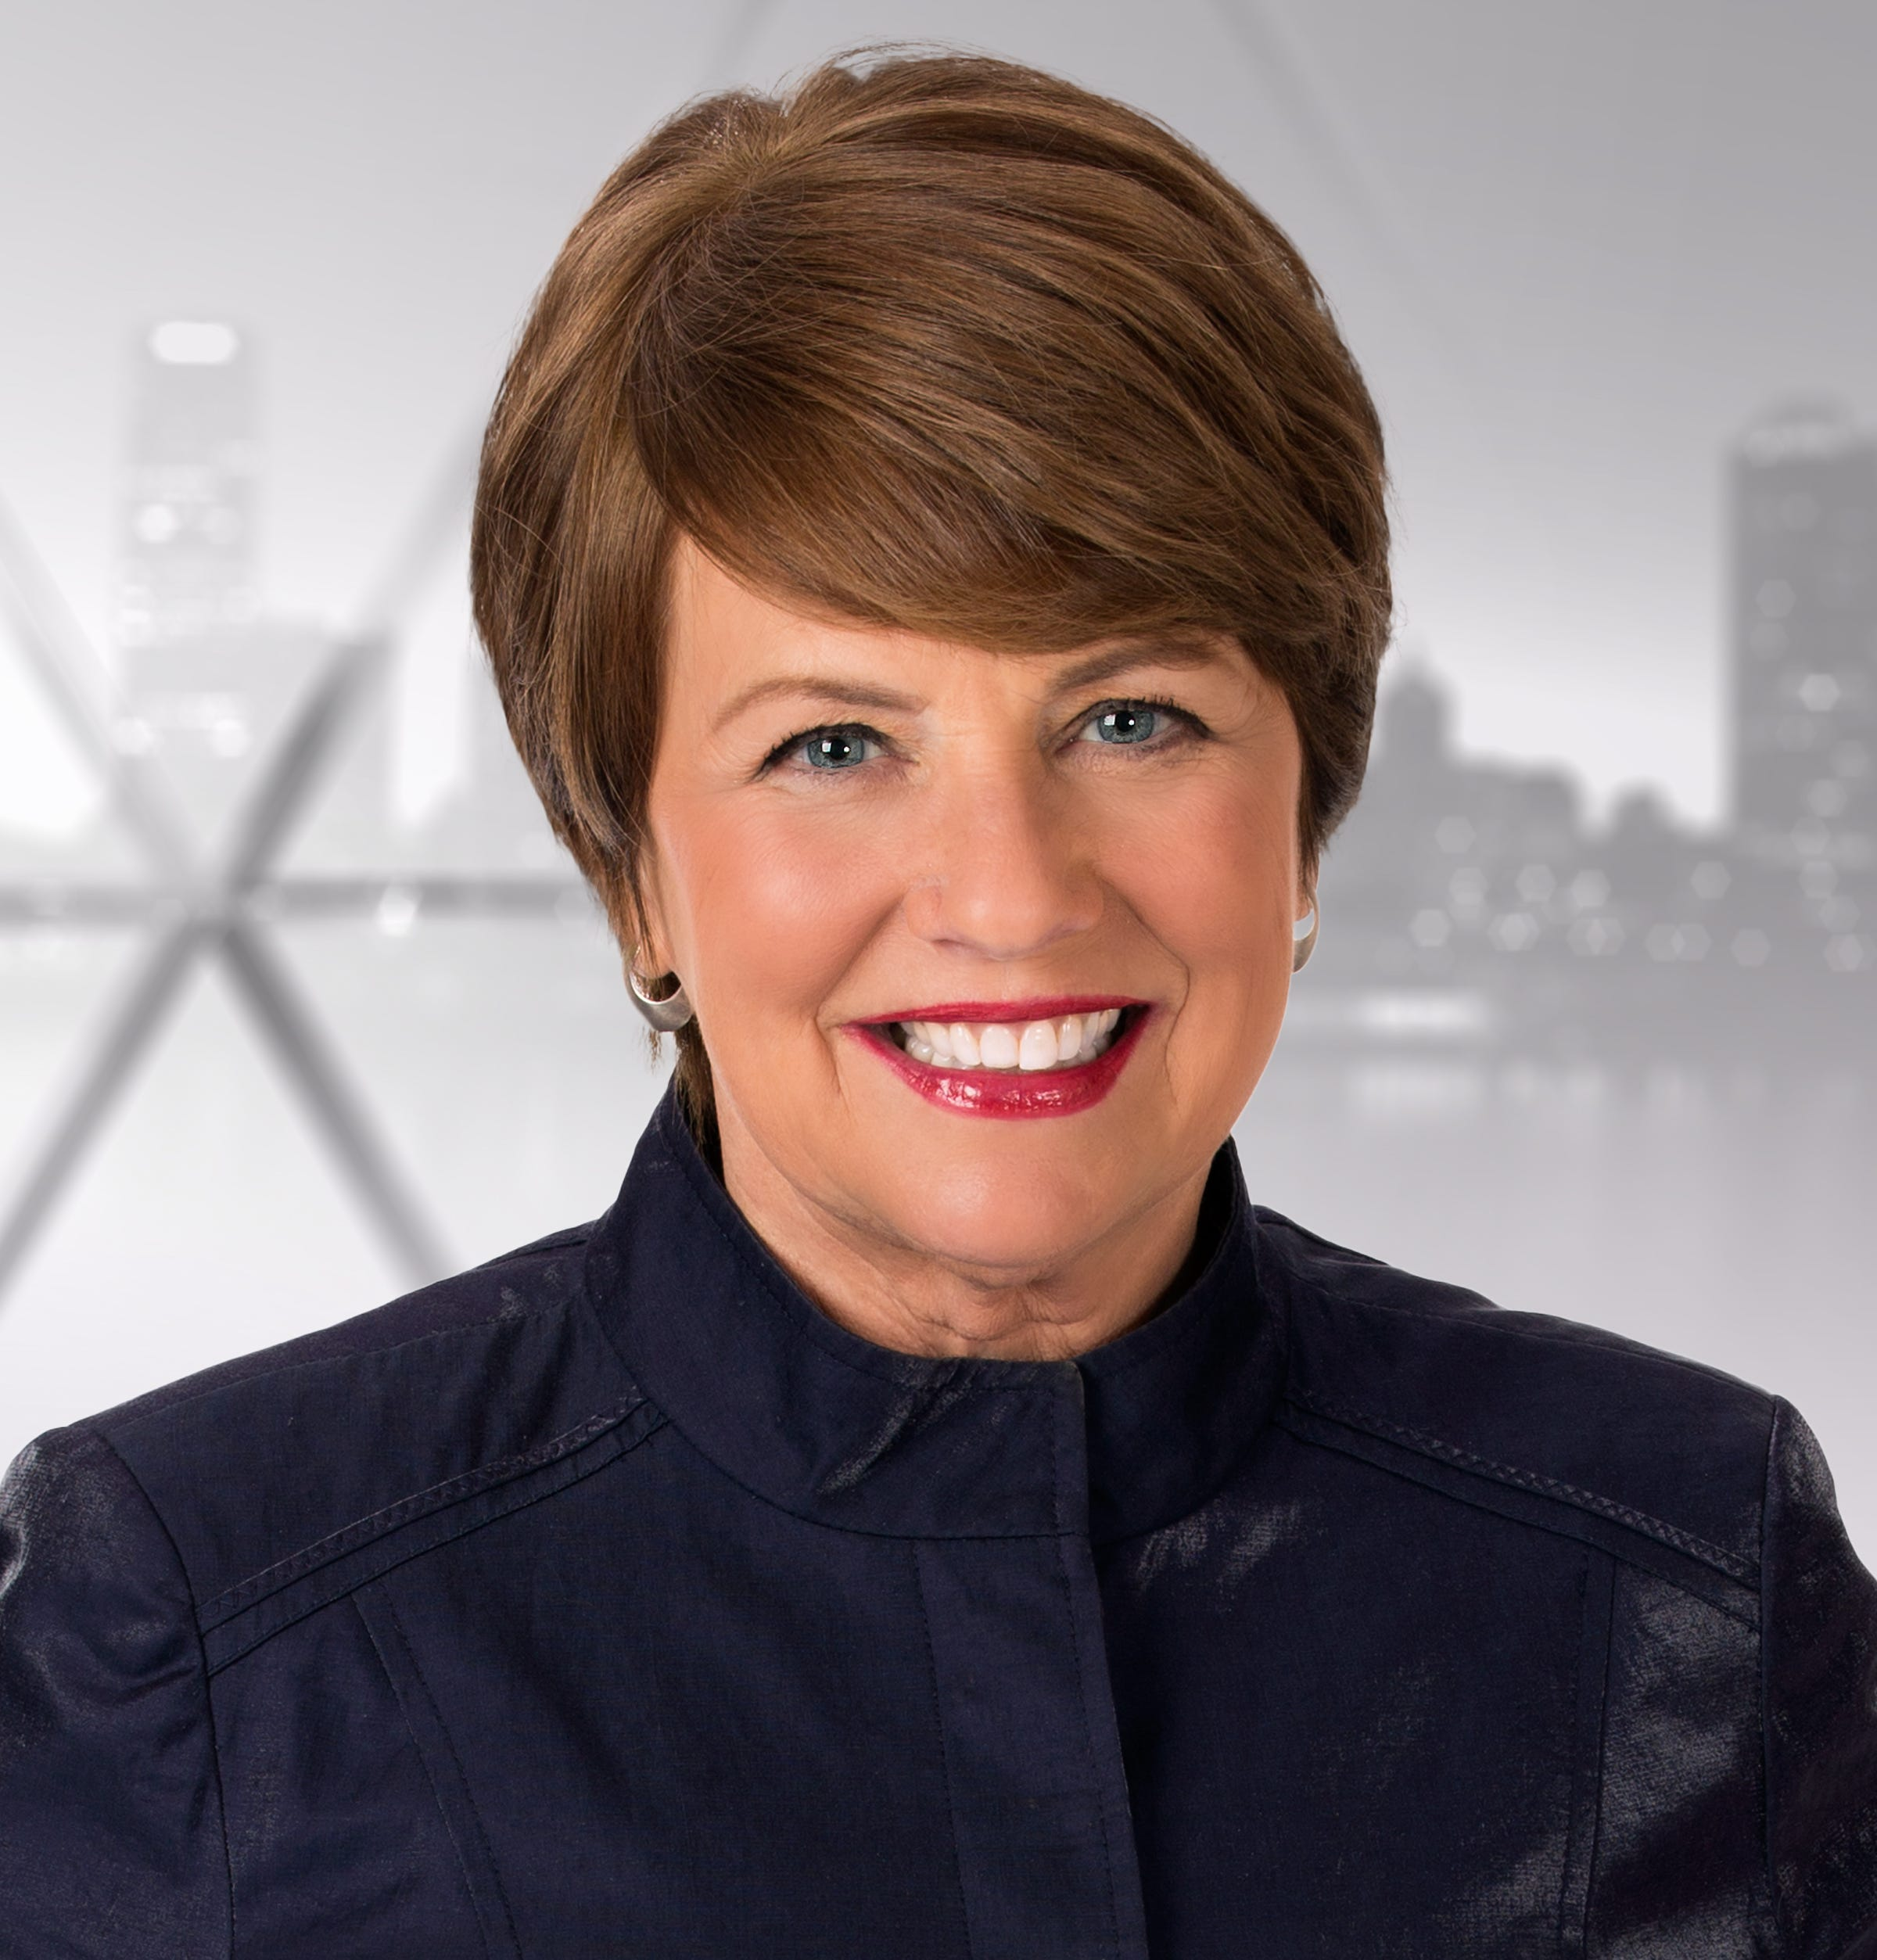 Kathy Mykleby